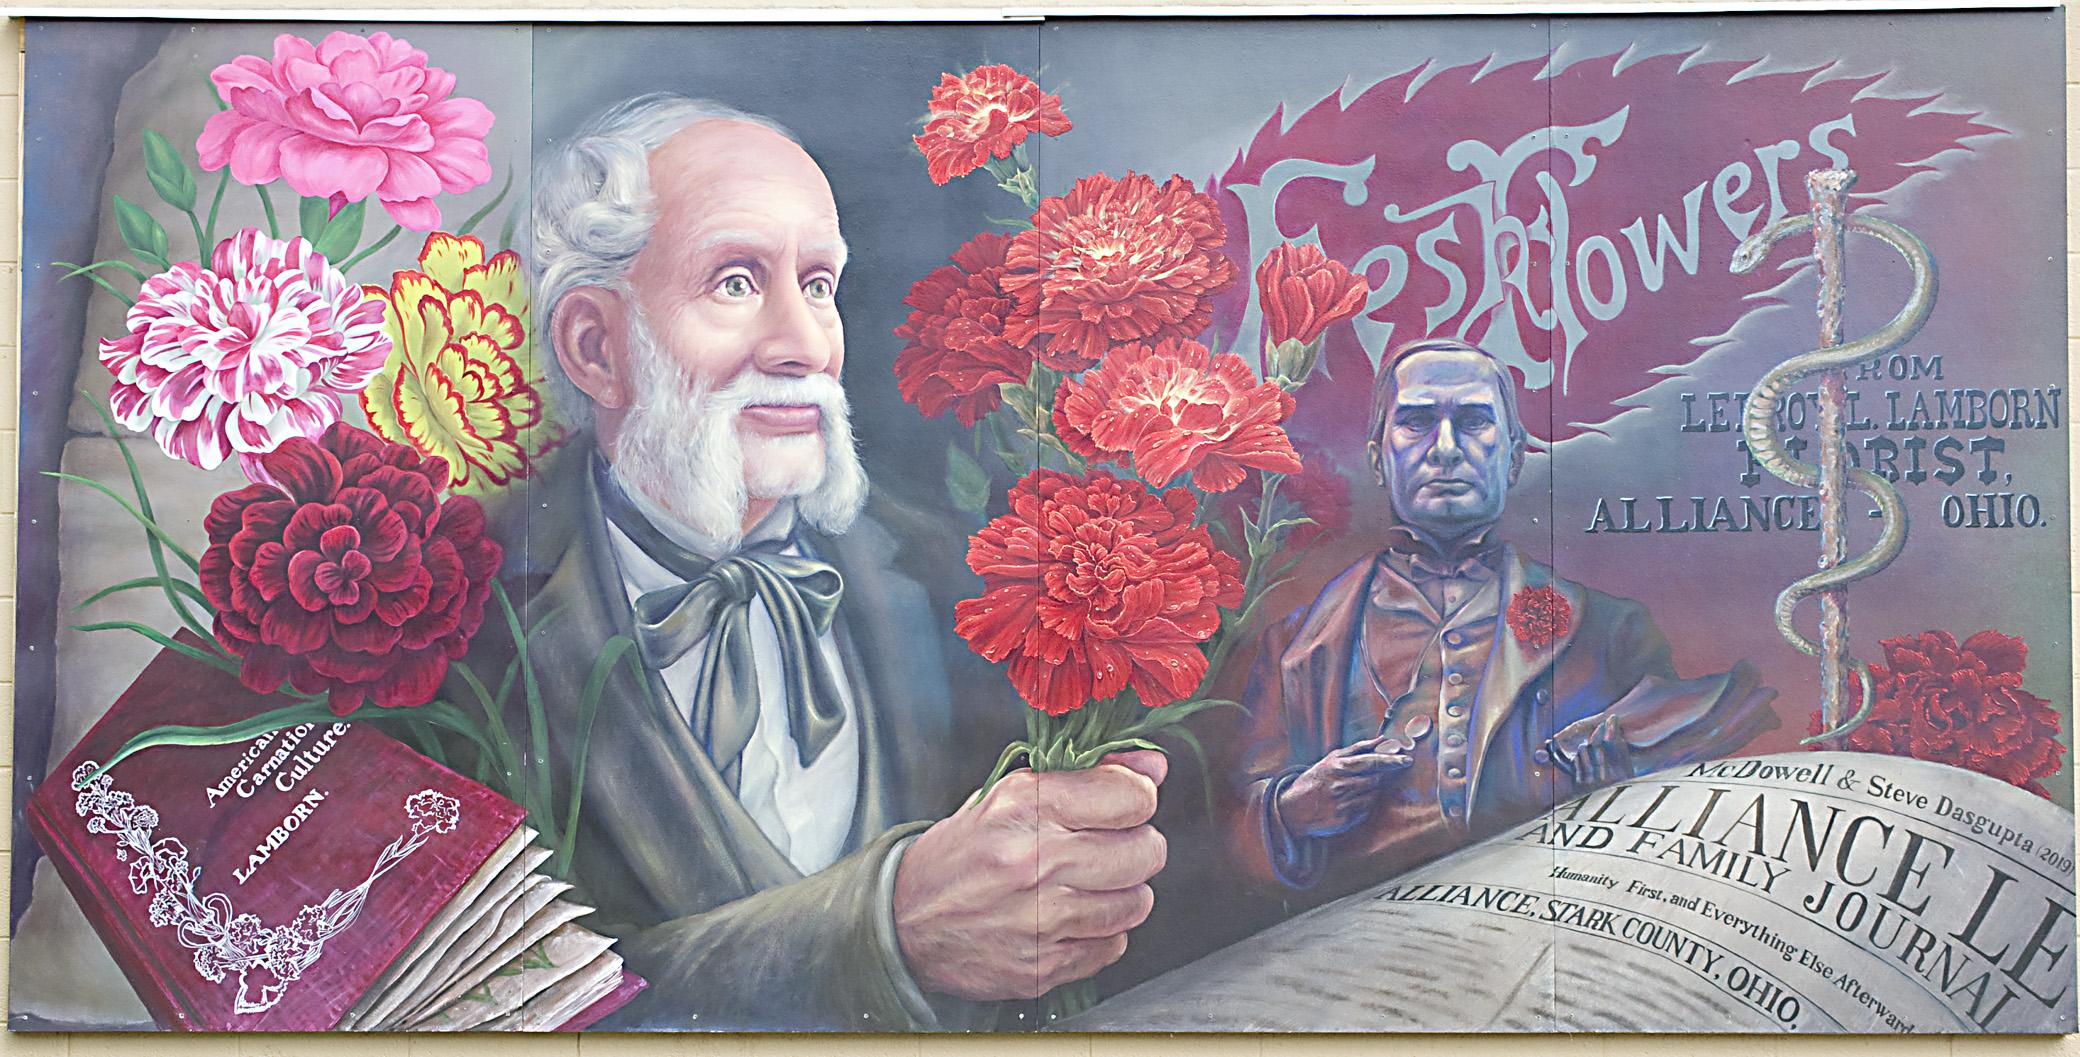 z Lanborn McKinley mural Alliance Ohio